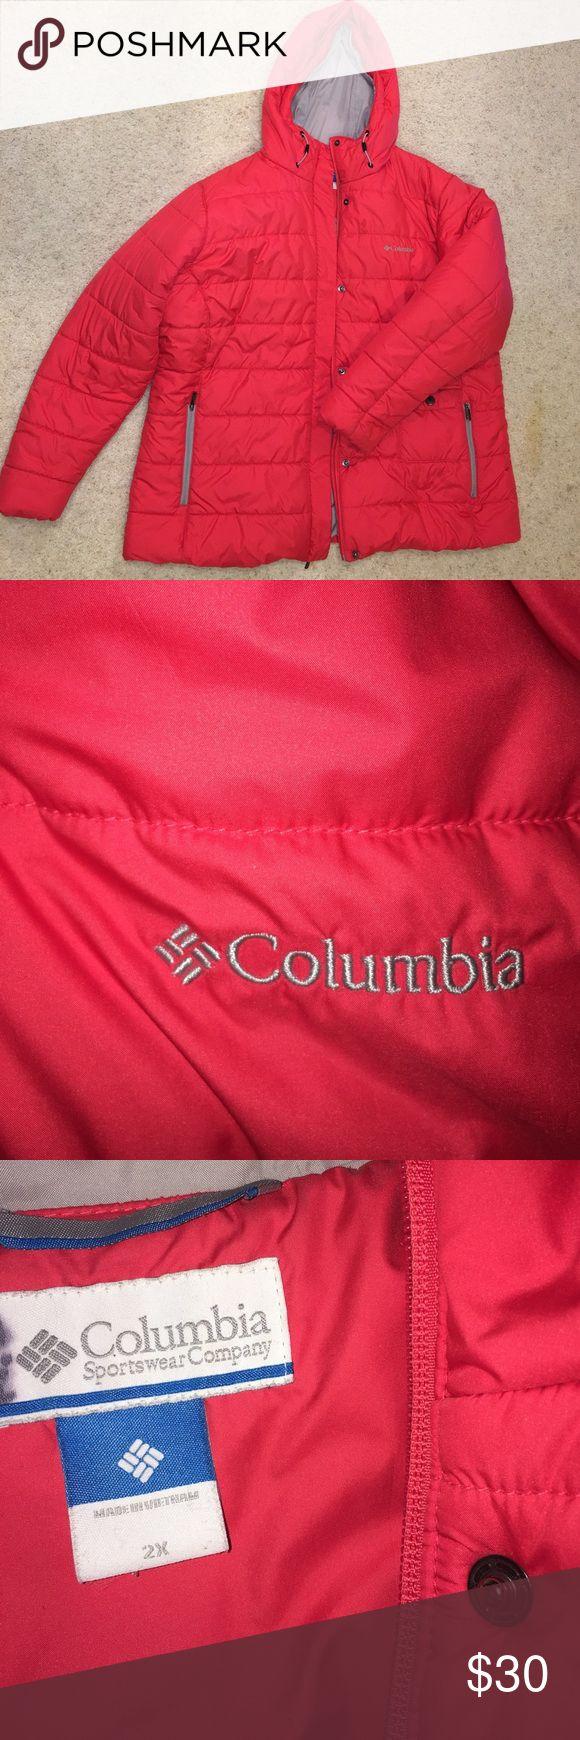 Women's winter coat Orange/ pink colored Columbia coat Columbia Jackets & Coats Puffers